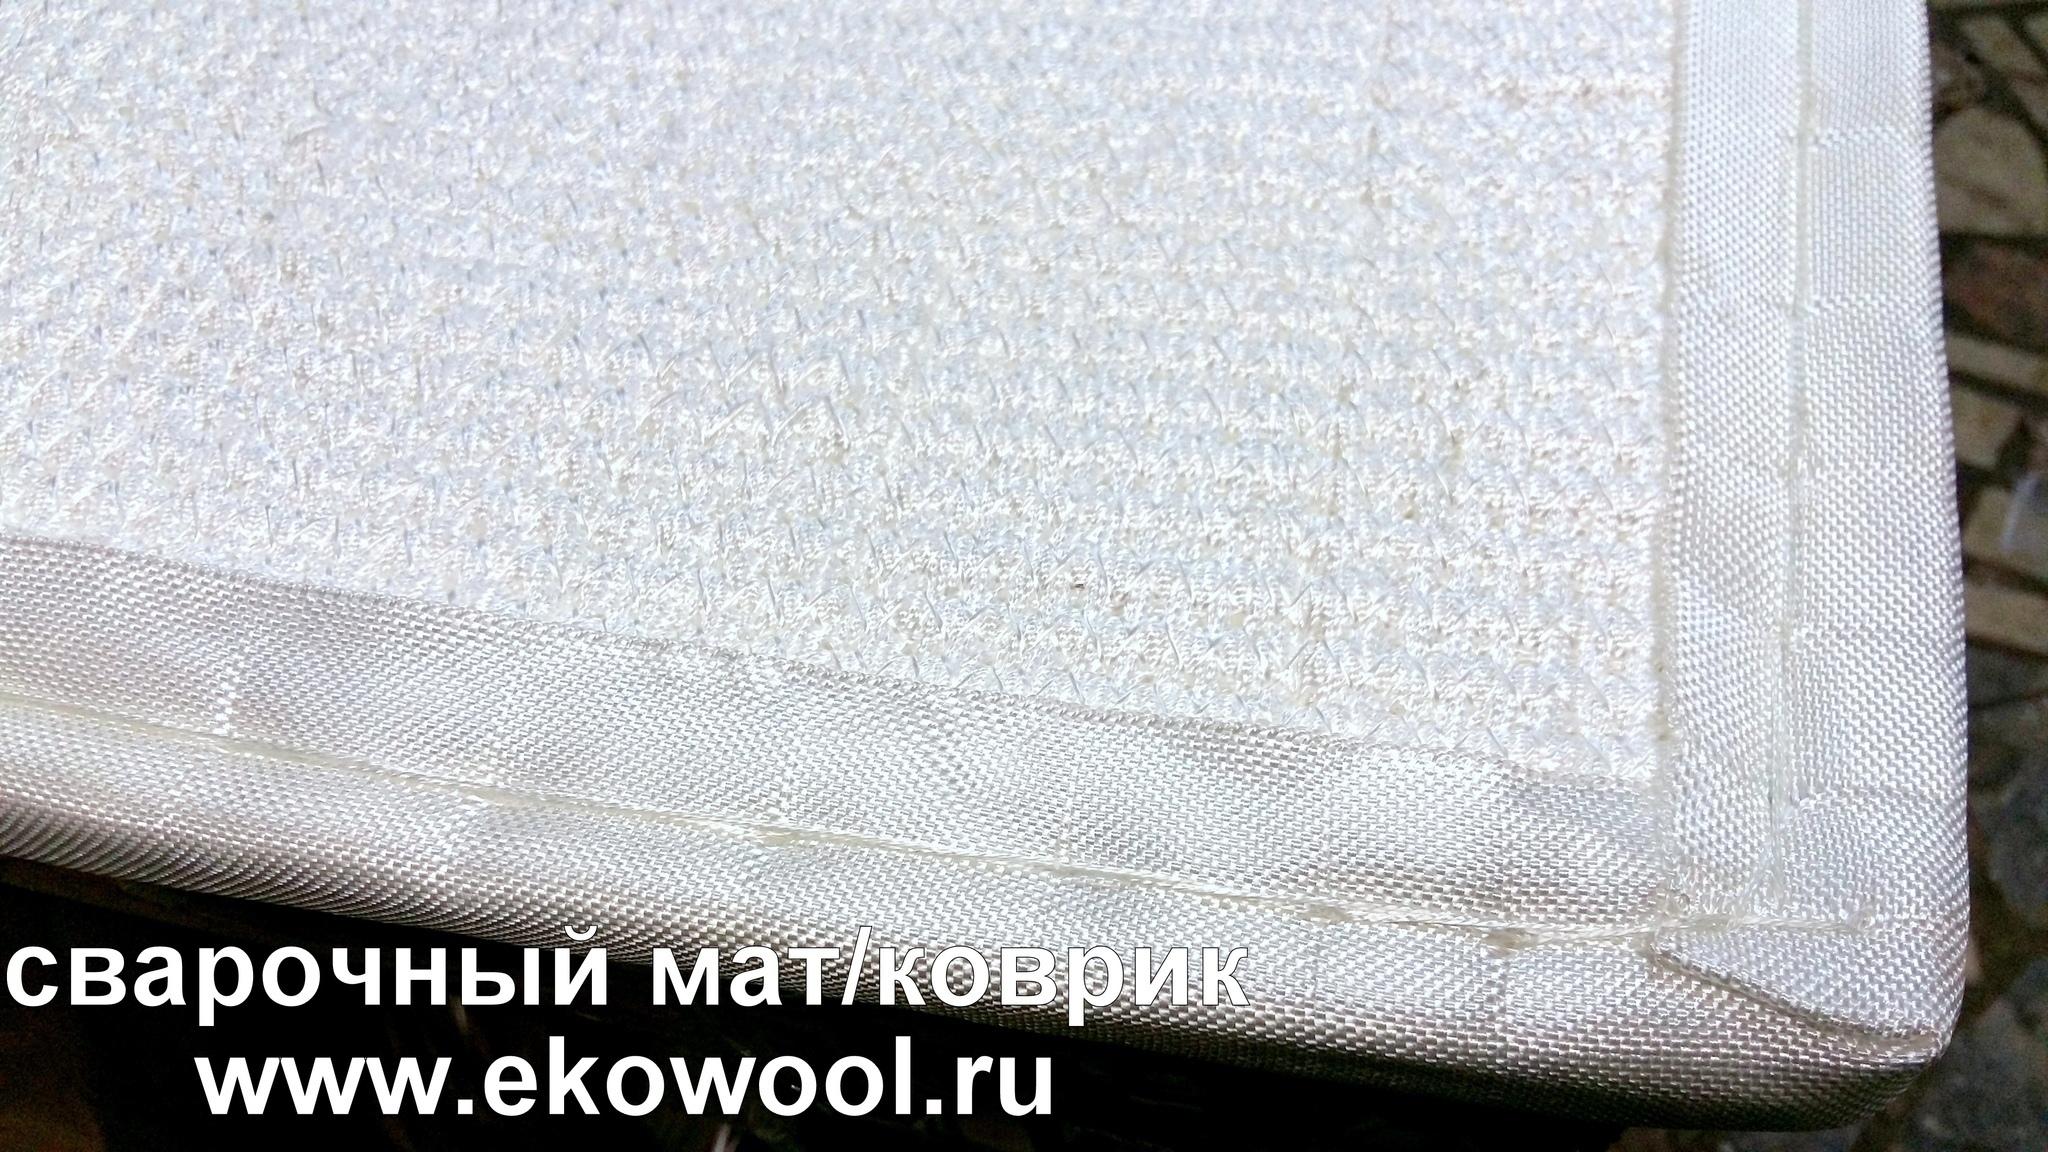 Окантовка коврика для сварщика